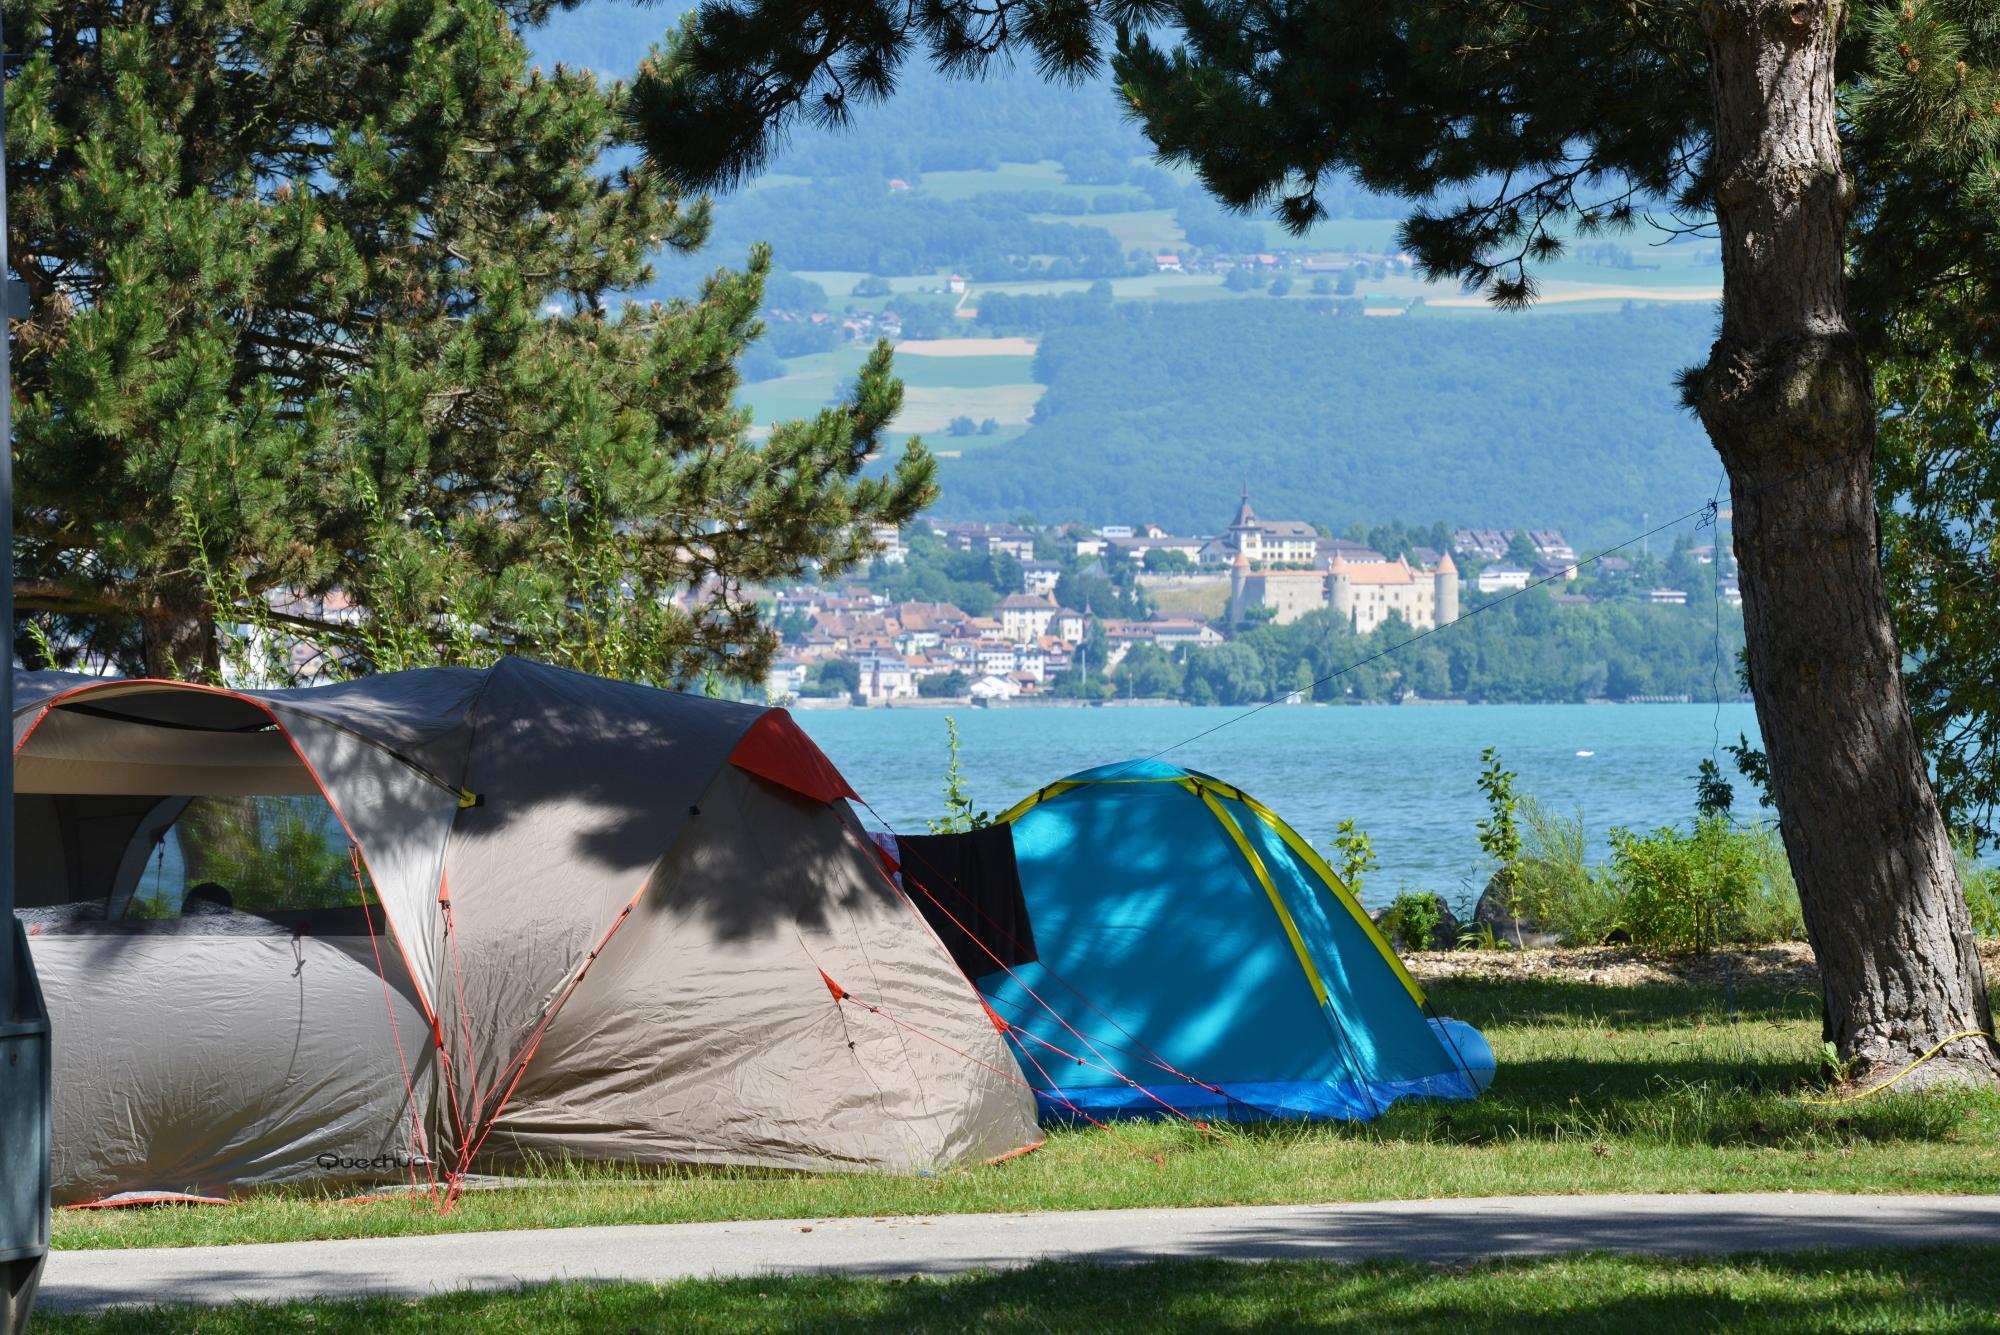 Campingplatz yverdon plage yverdon les bains region for Piscine yverdon